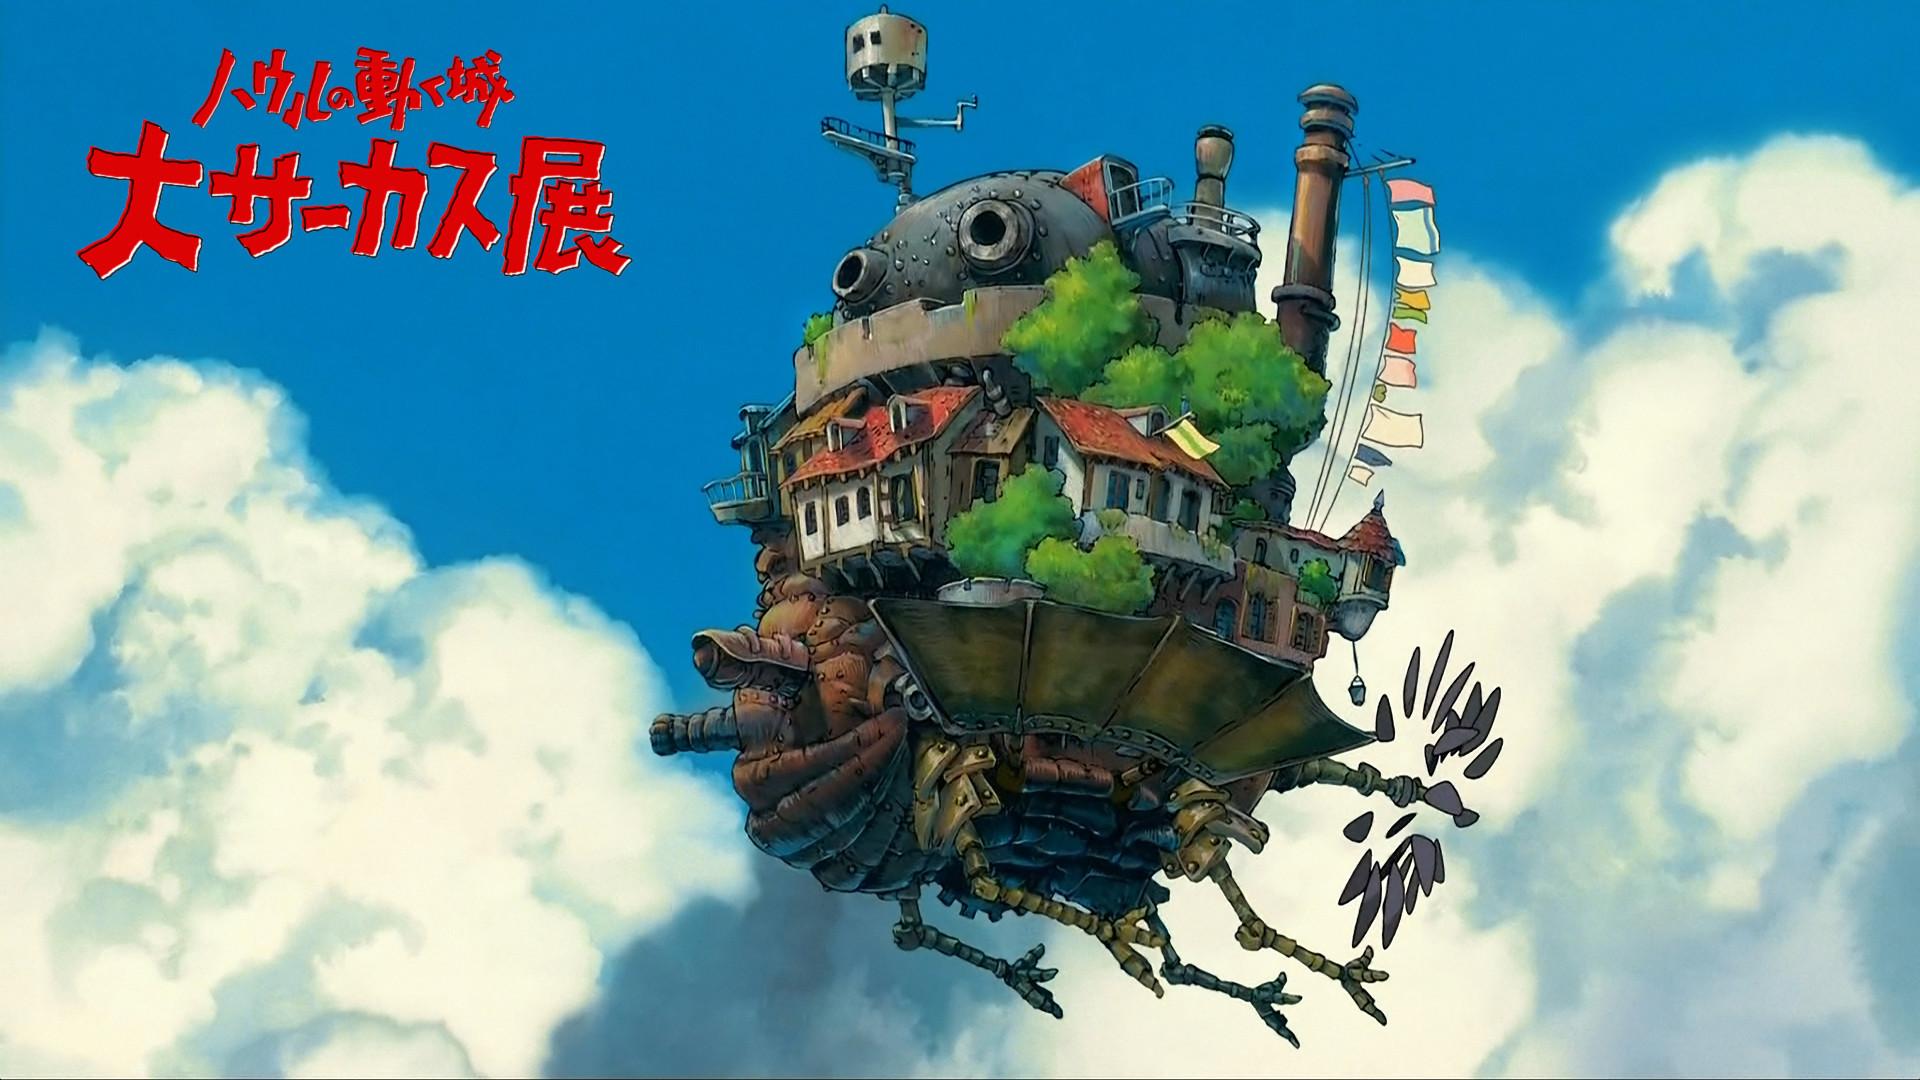 Howl's Moving Castle 2 (Fake) movie poster by DaisyLovin on DeviantArt